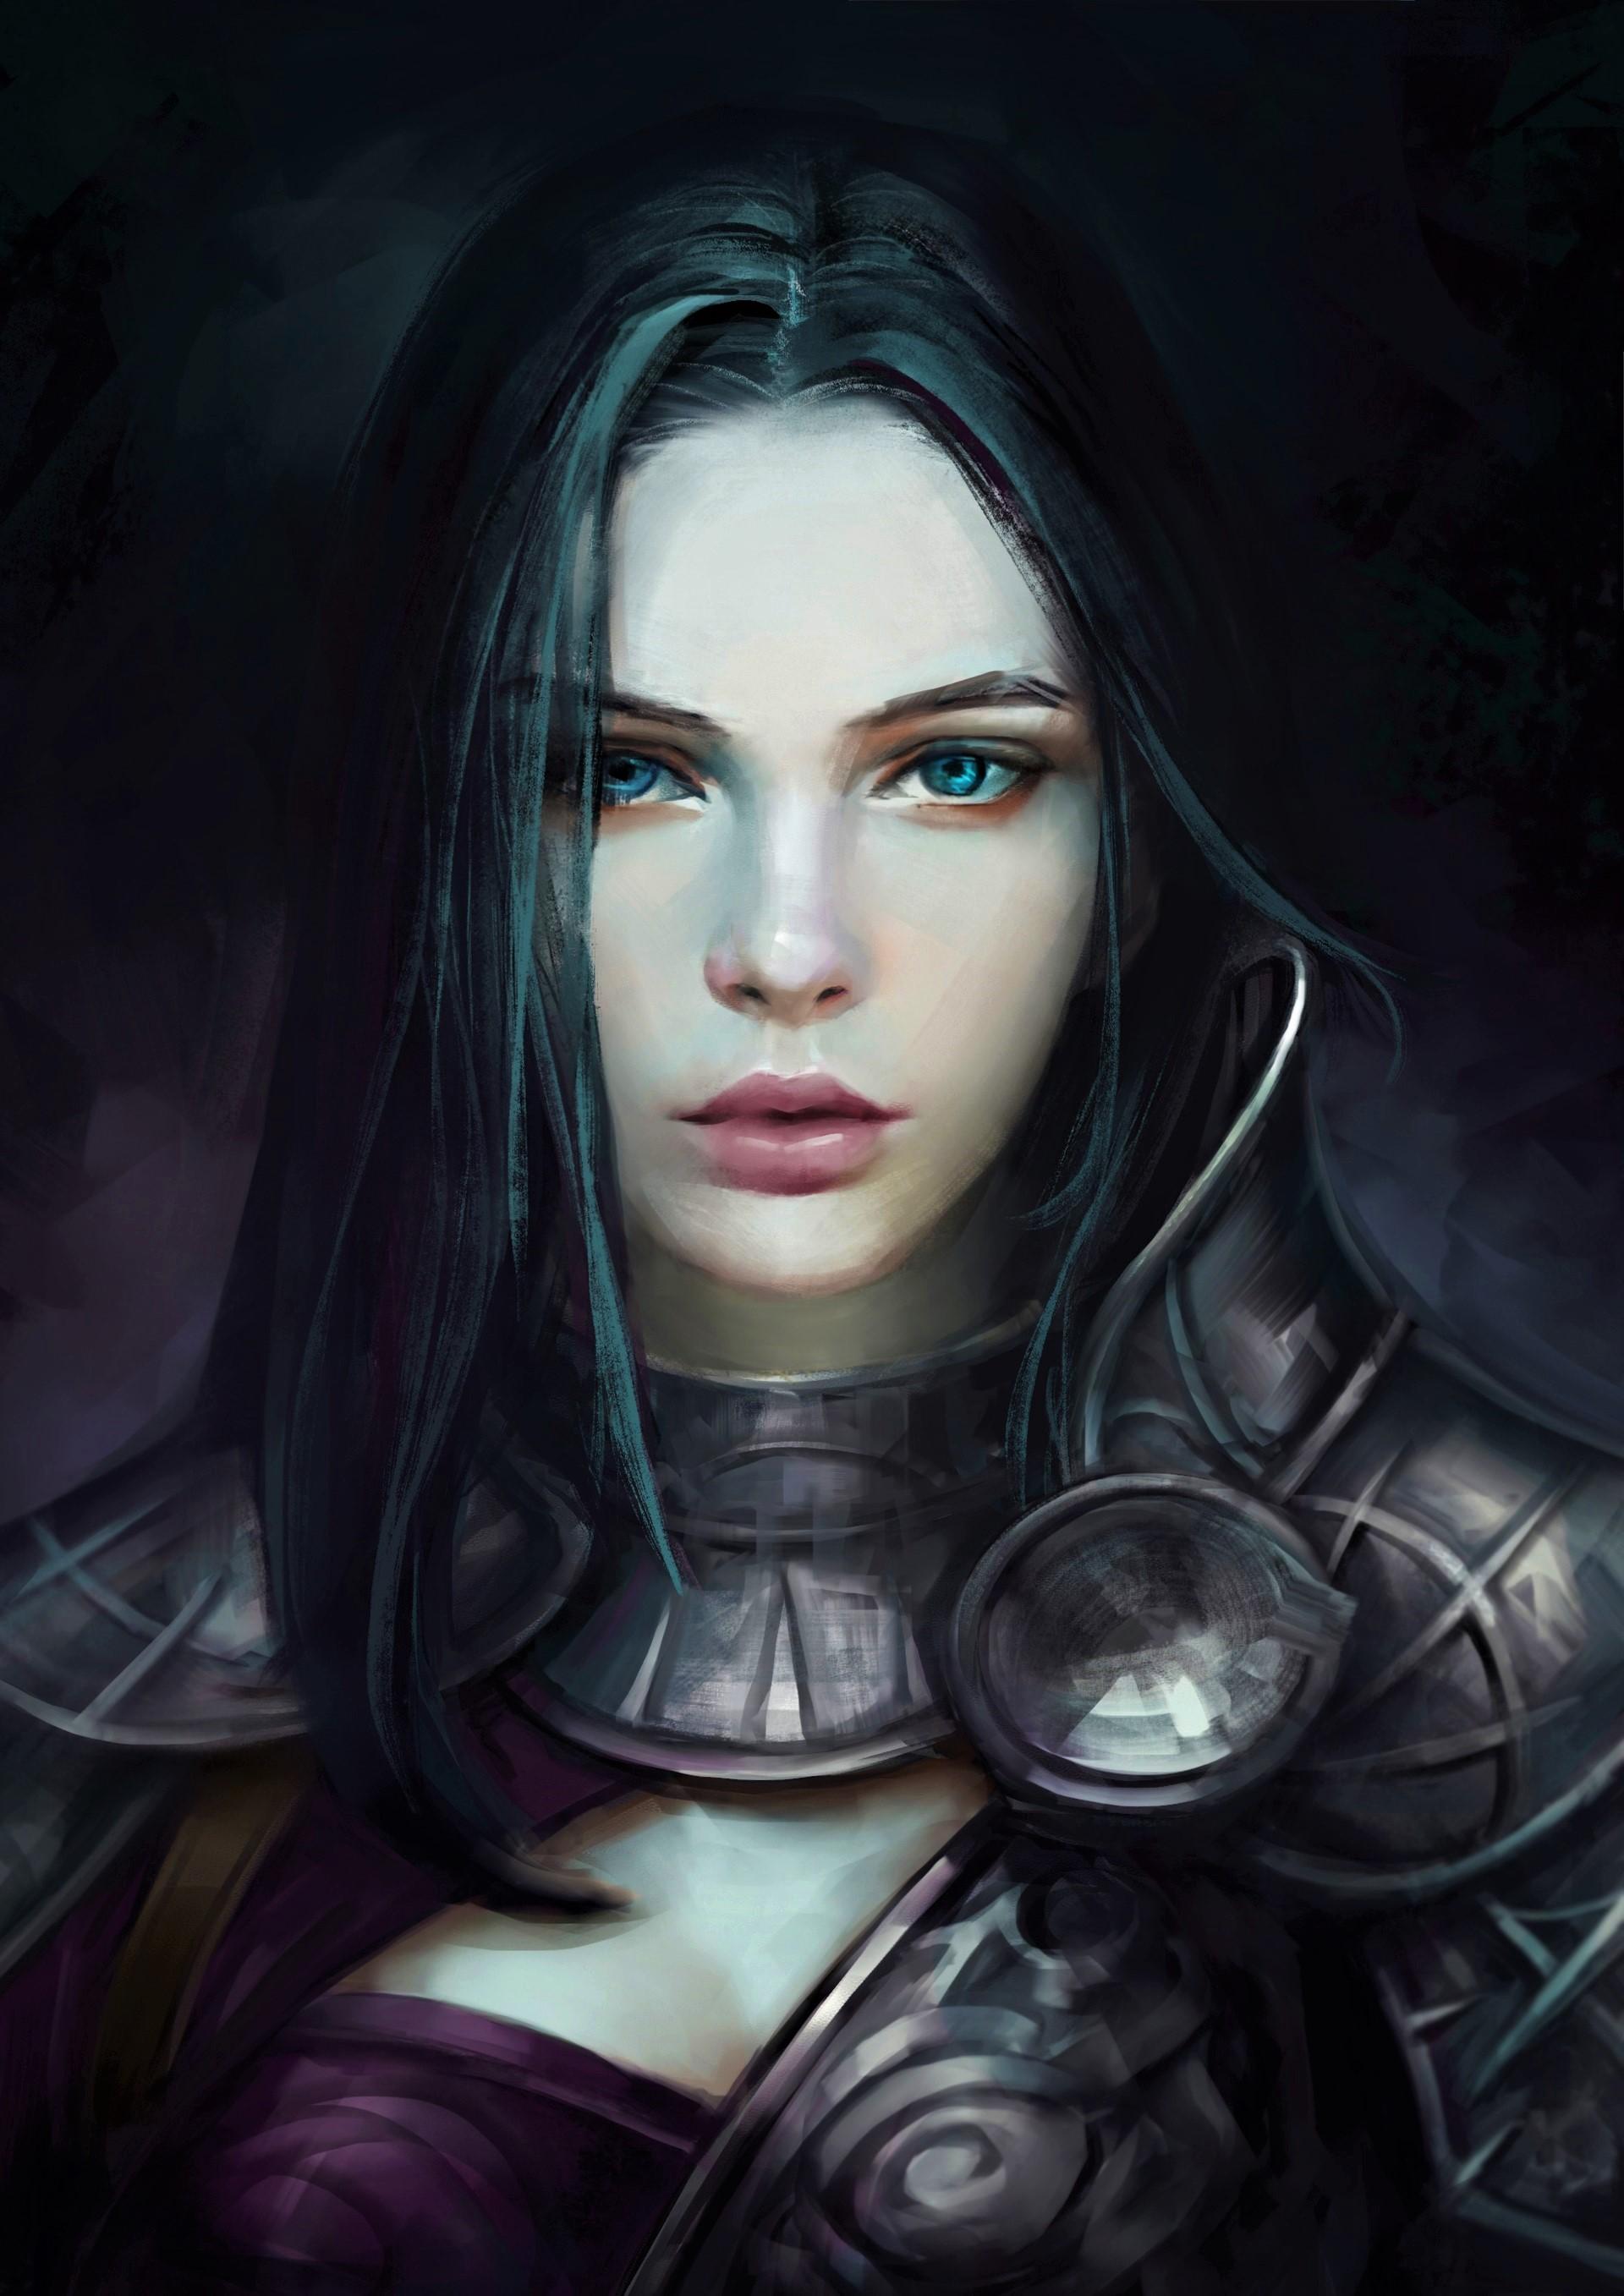 Warrior girl art id 110295 art abyss - Fantasy female warrior artwork ...